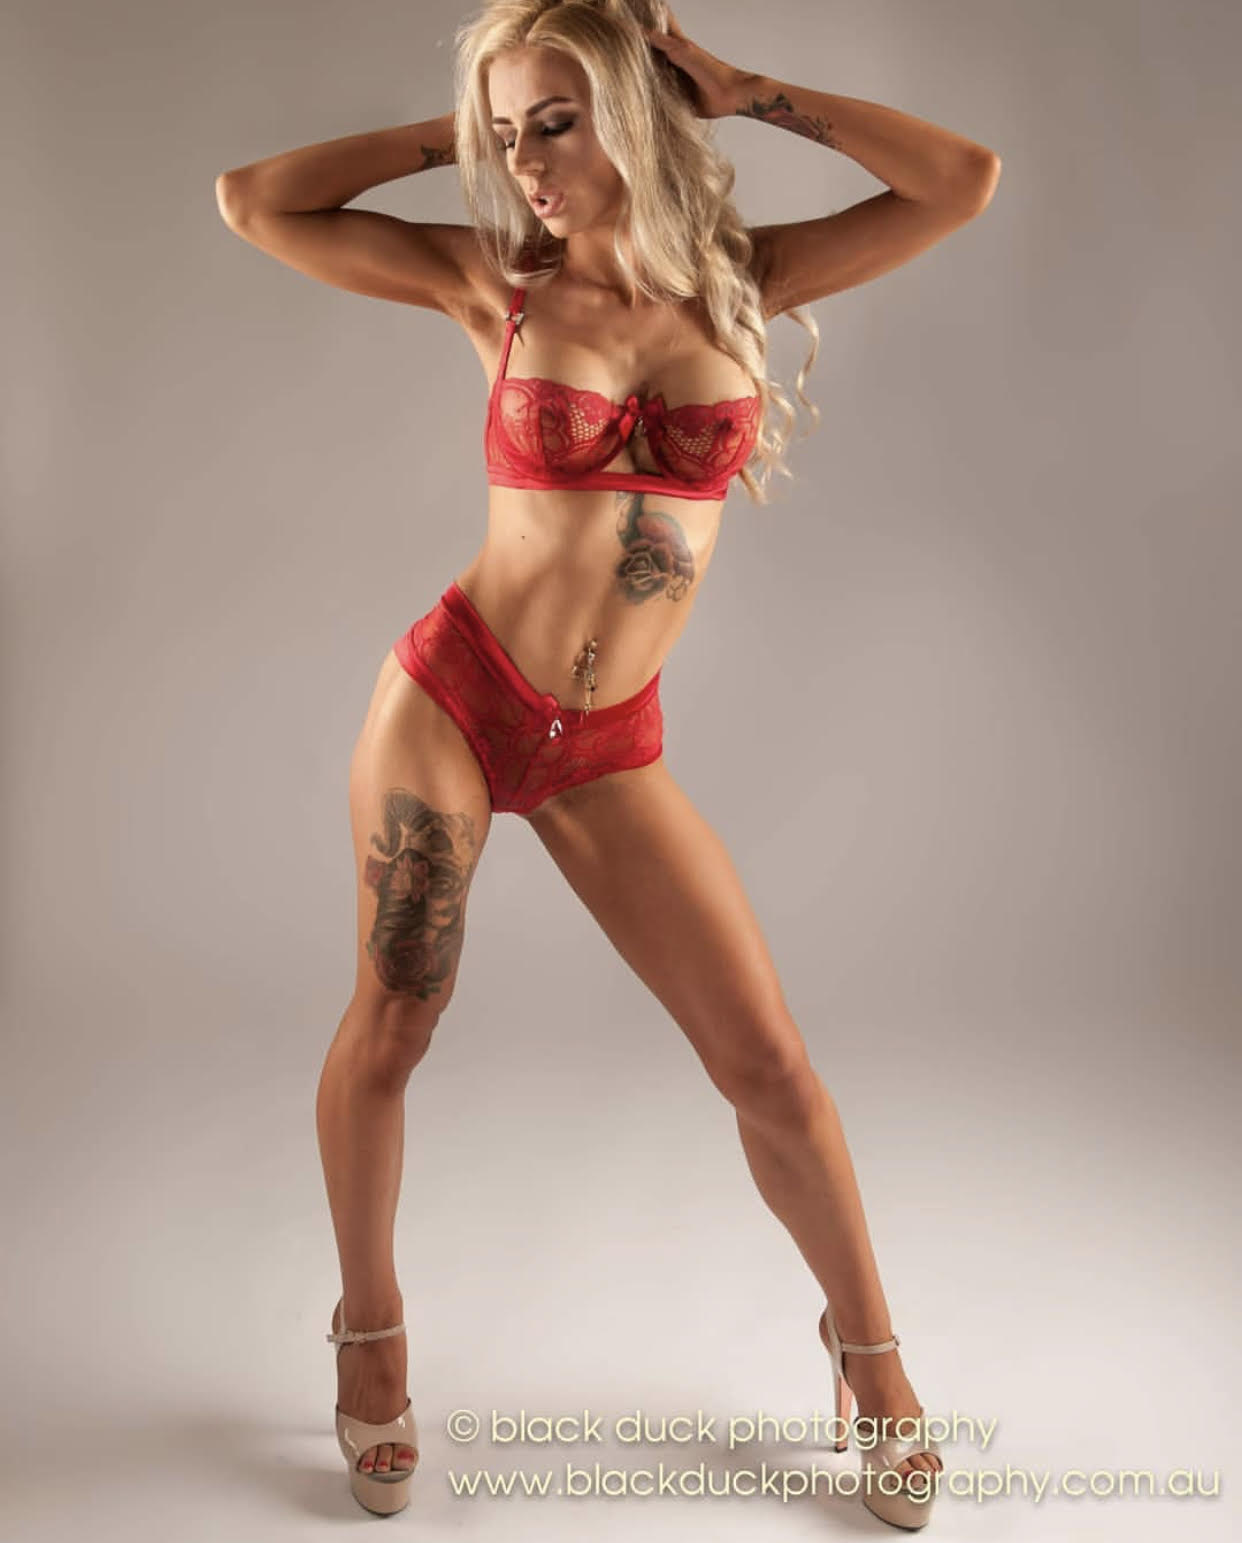 Aleisha Stripper Adelaide